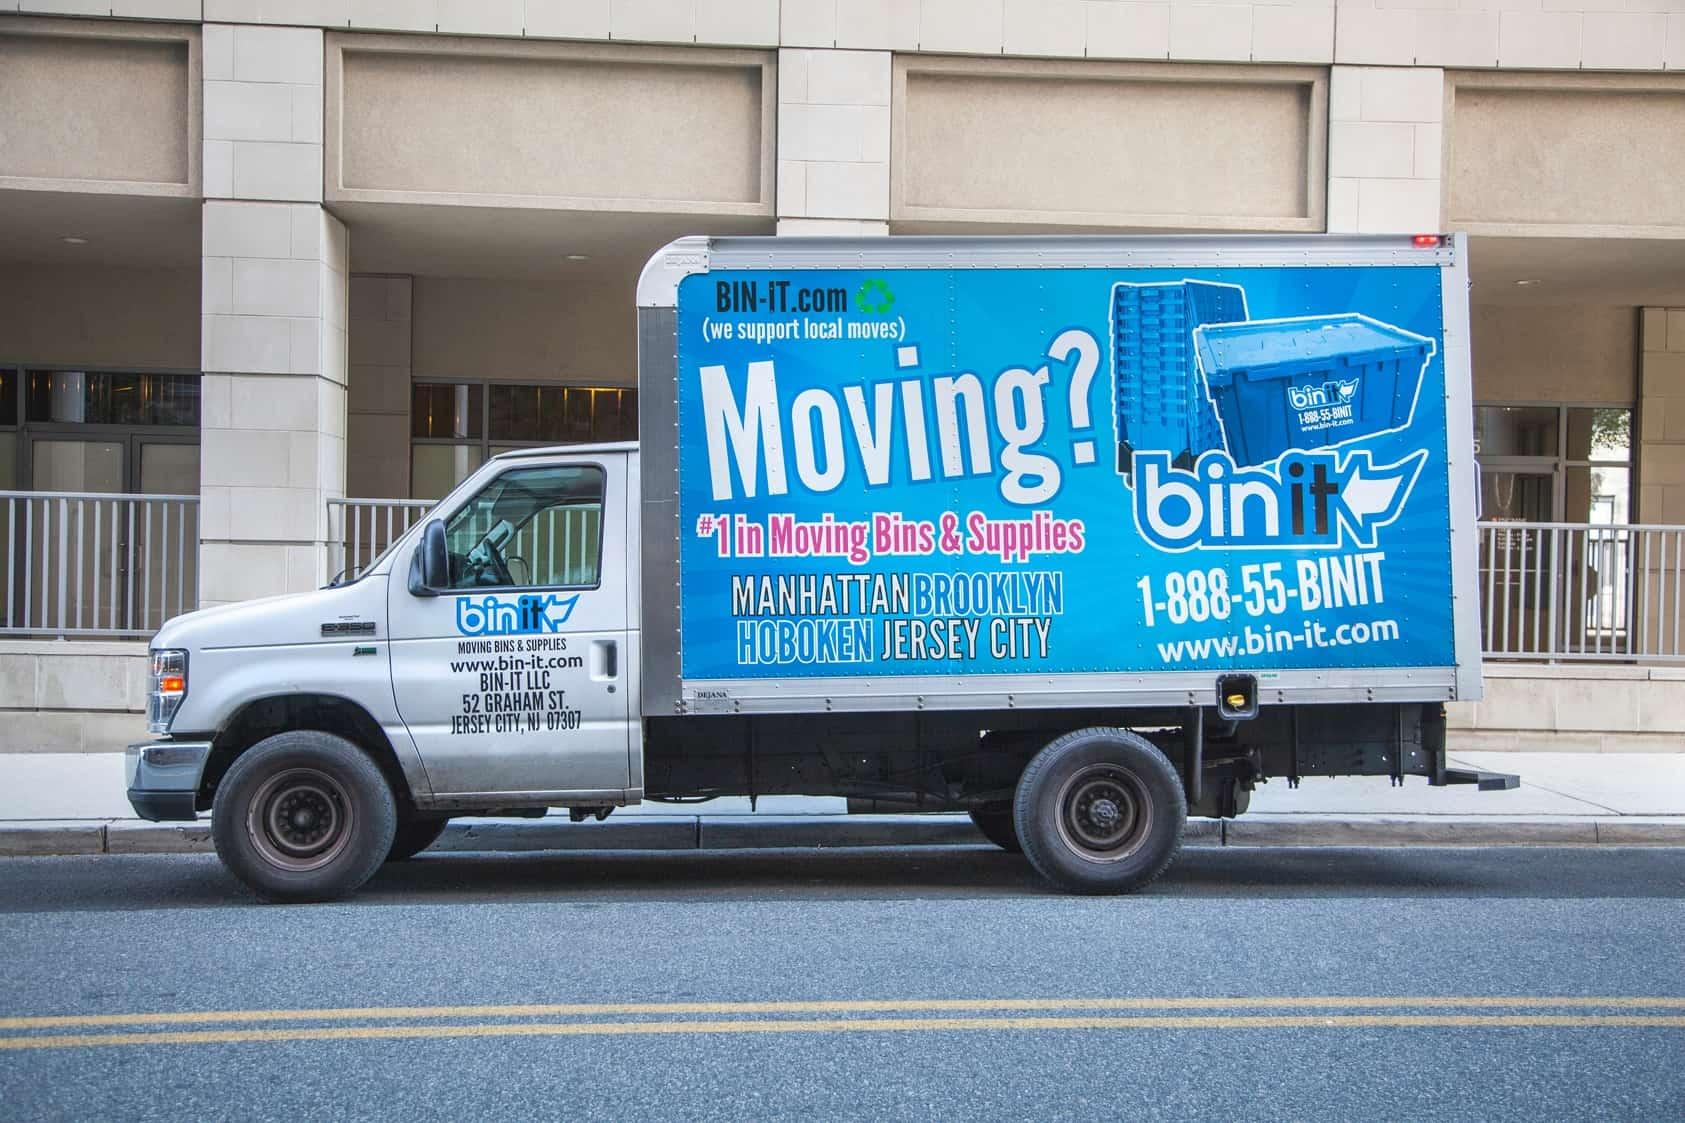 Bin it moving bins and supplies